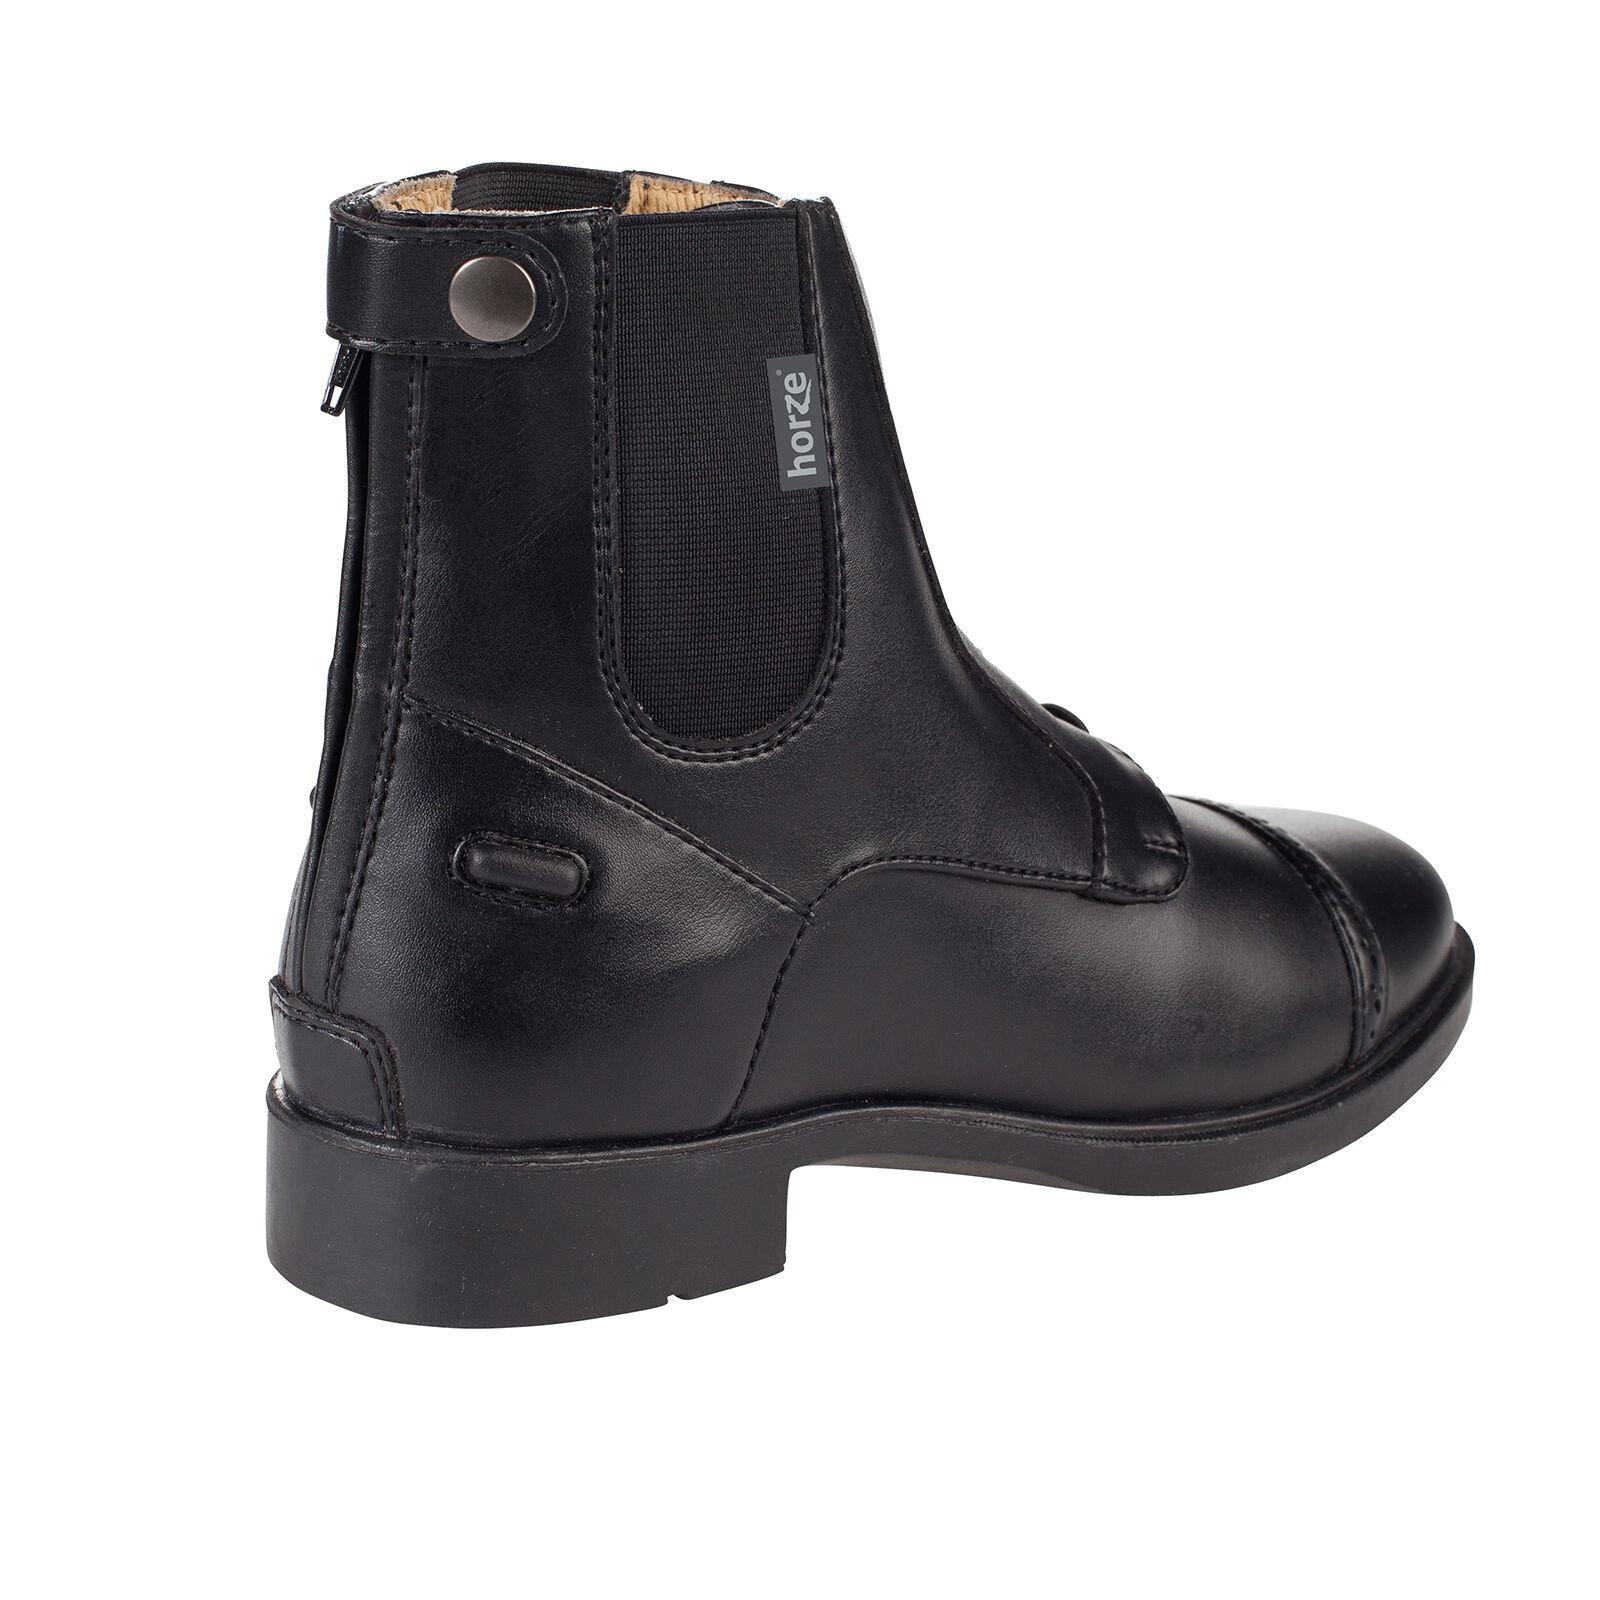 HORZE Kilkenny Jodhpur Boots PU XZlkN6Vjyv